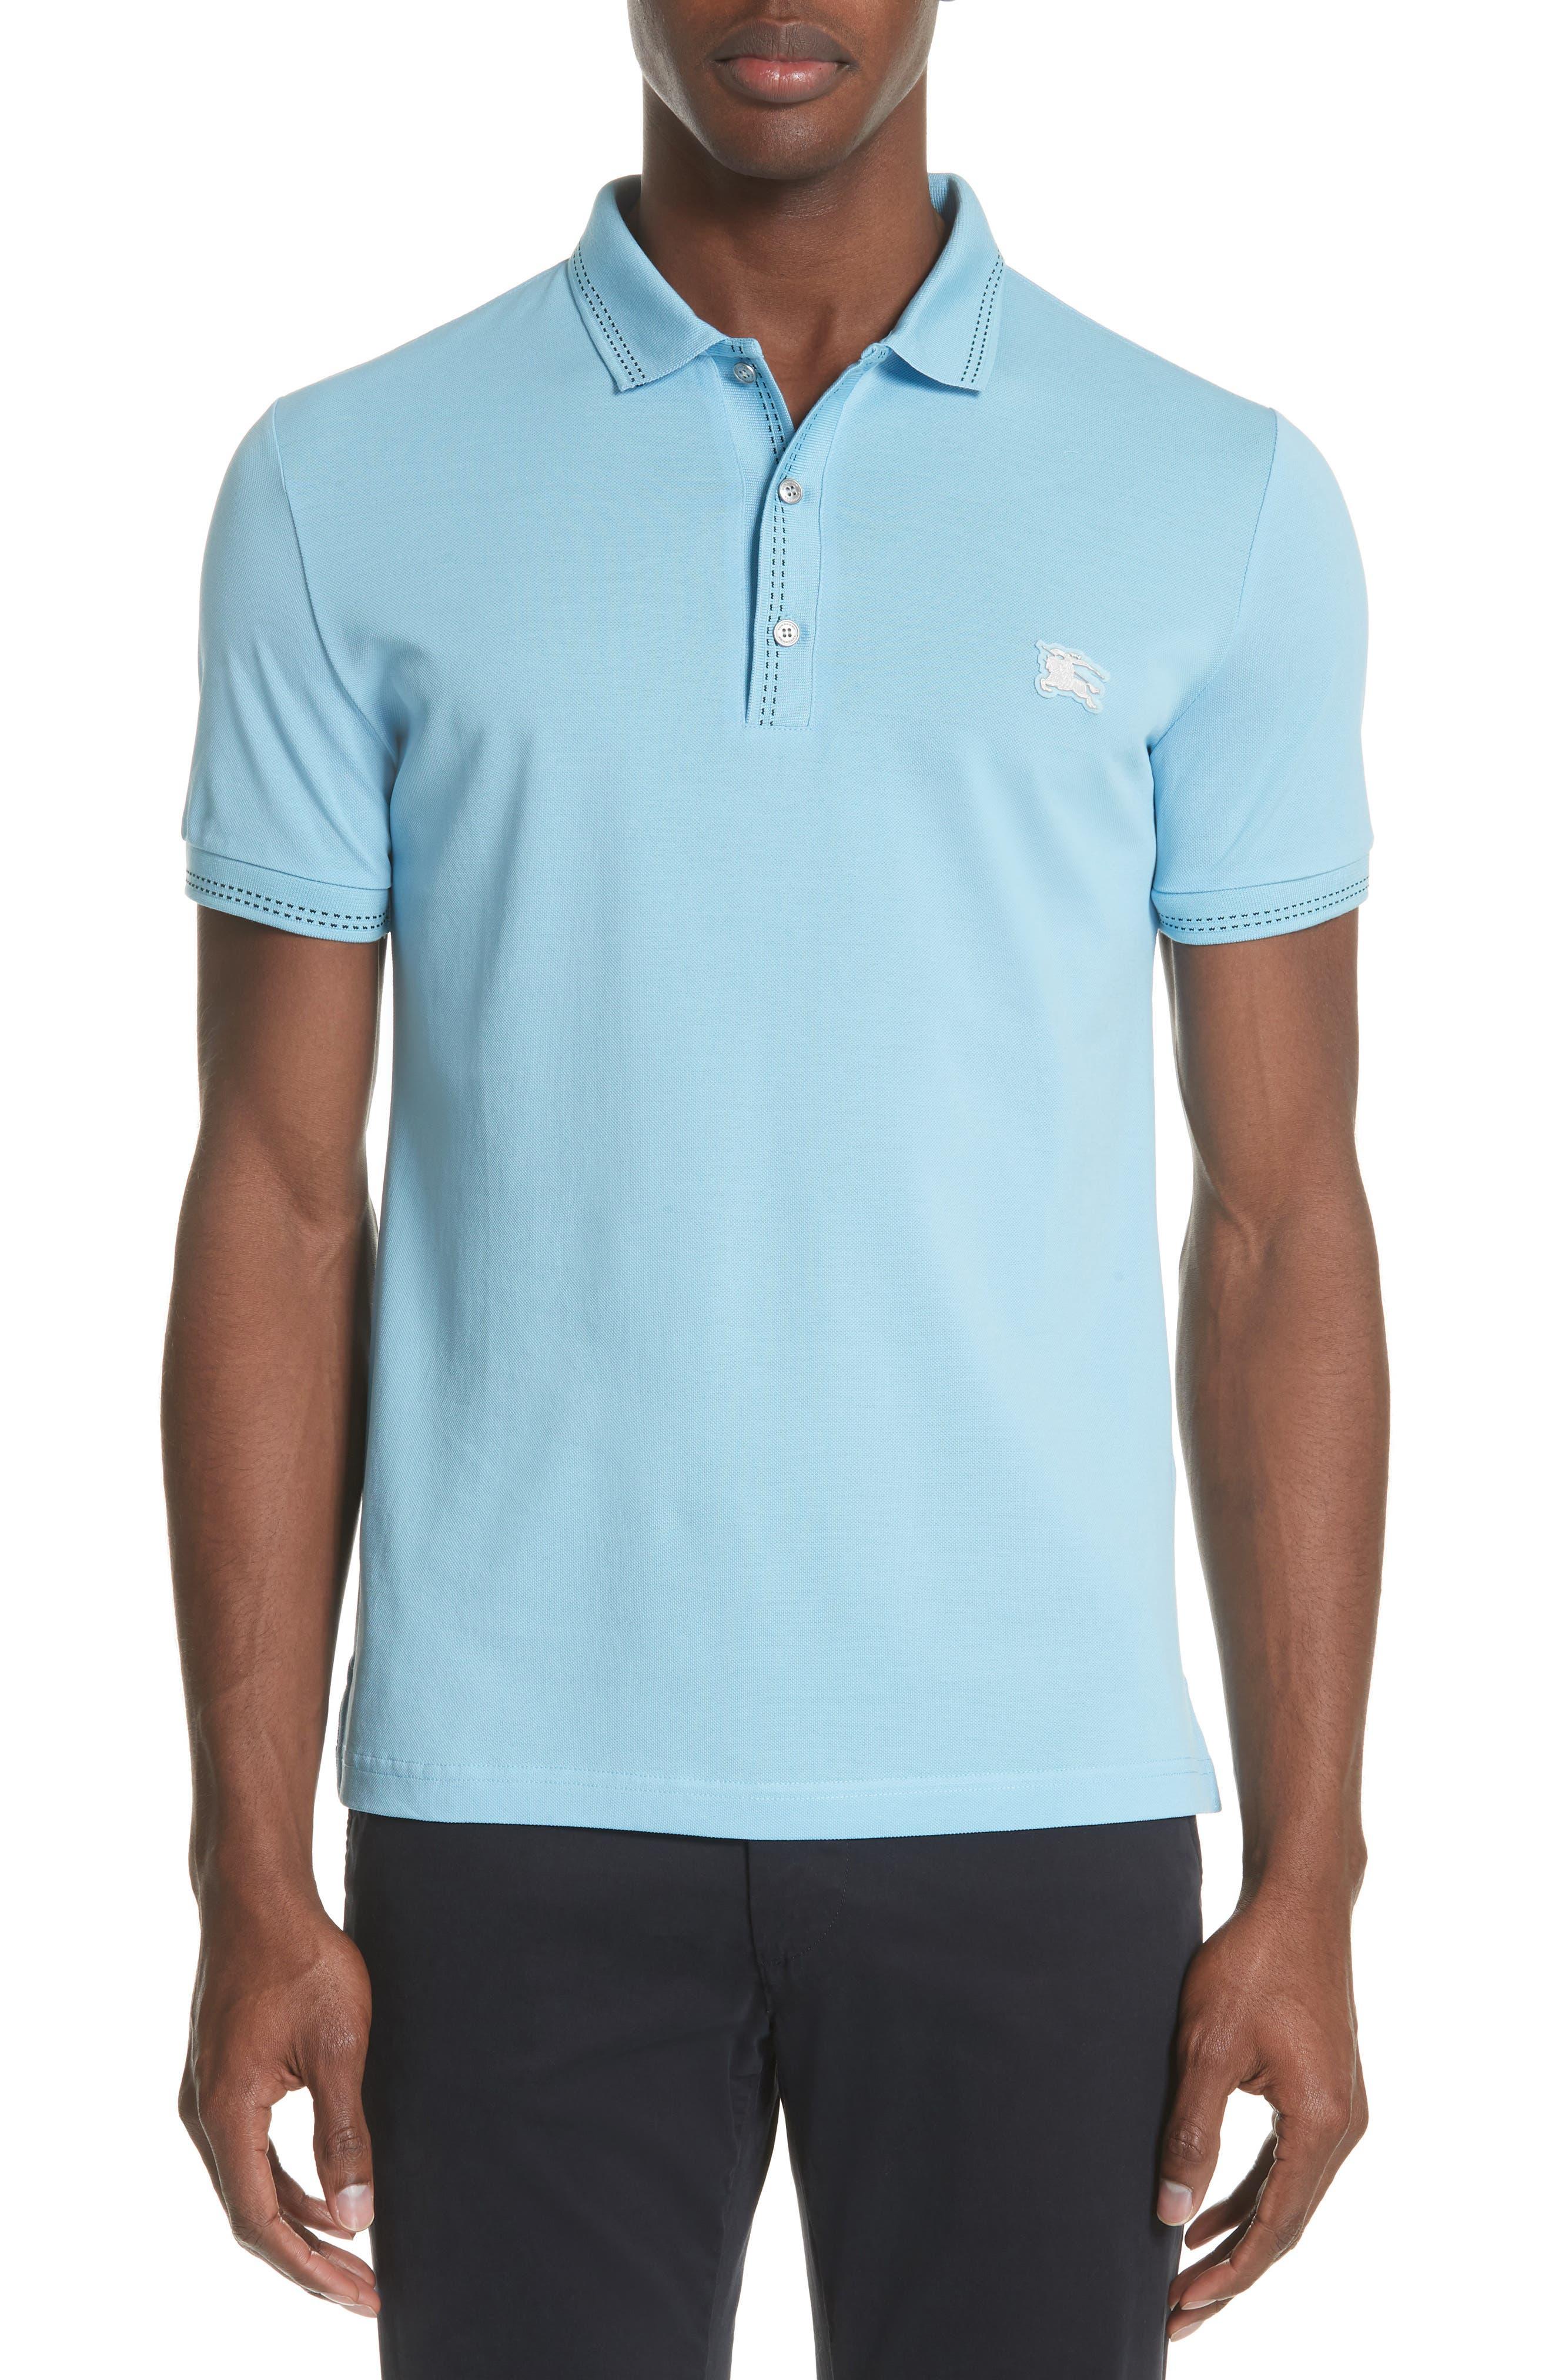 Nordstrom Mens Burberry Polo Shirt Rldm